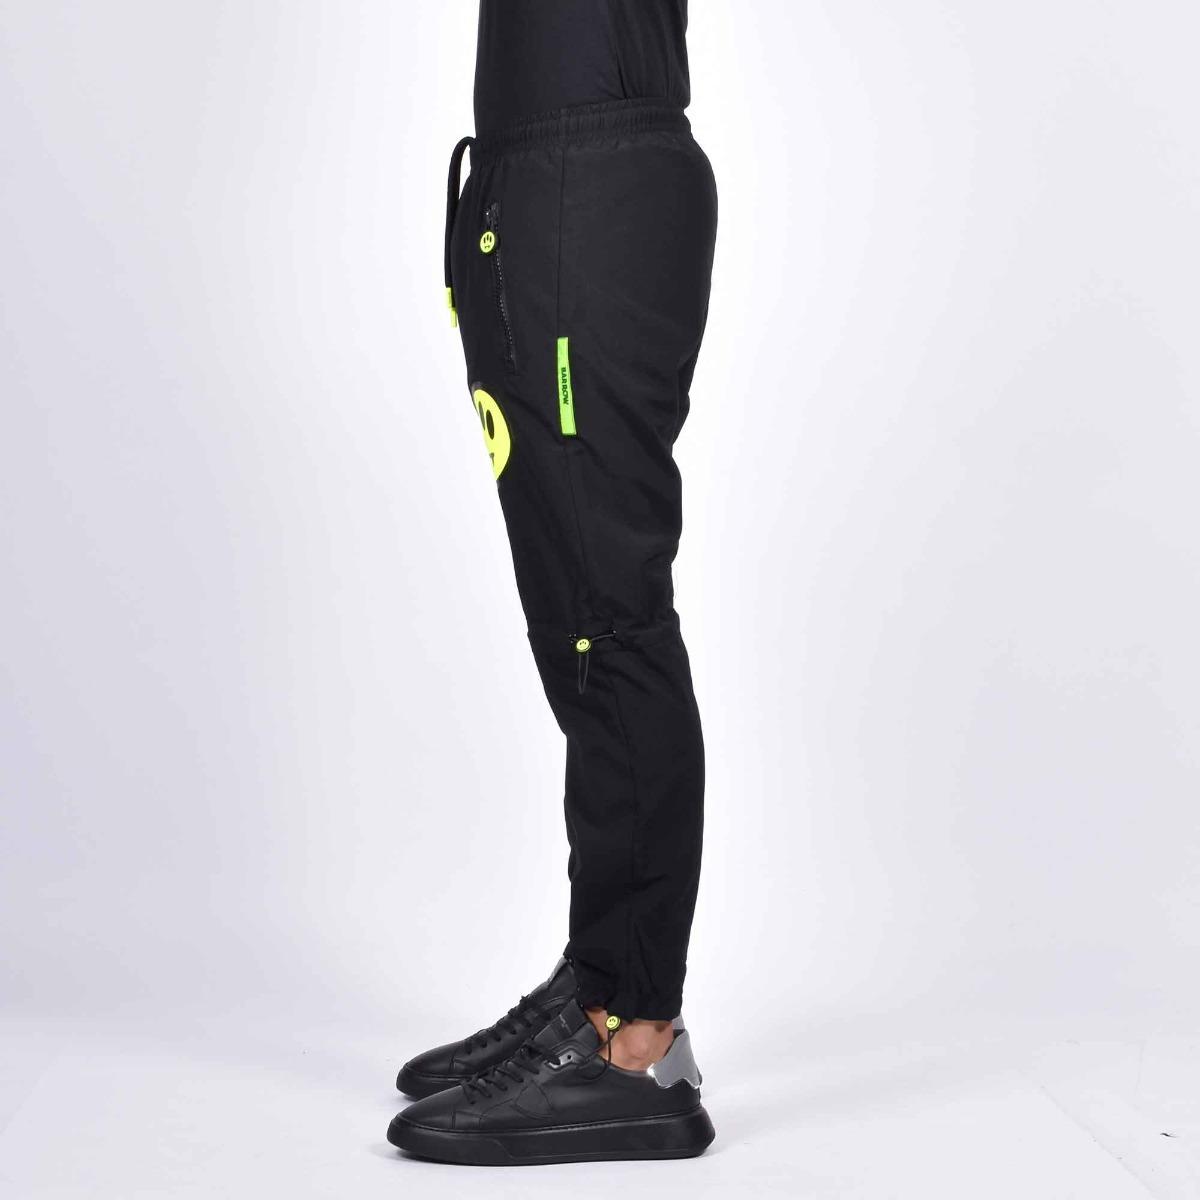 Pantalone inserto alien fluo - Nero